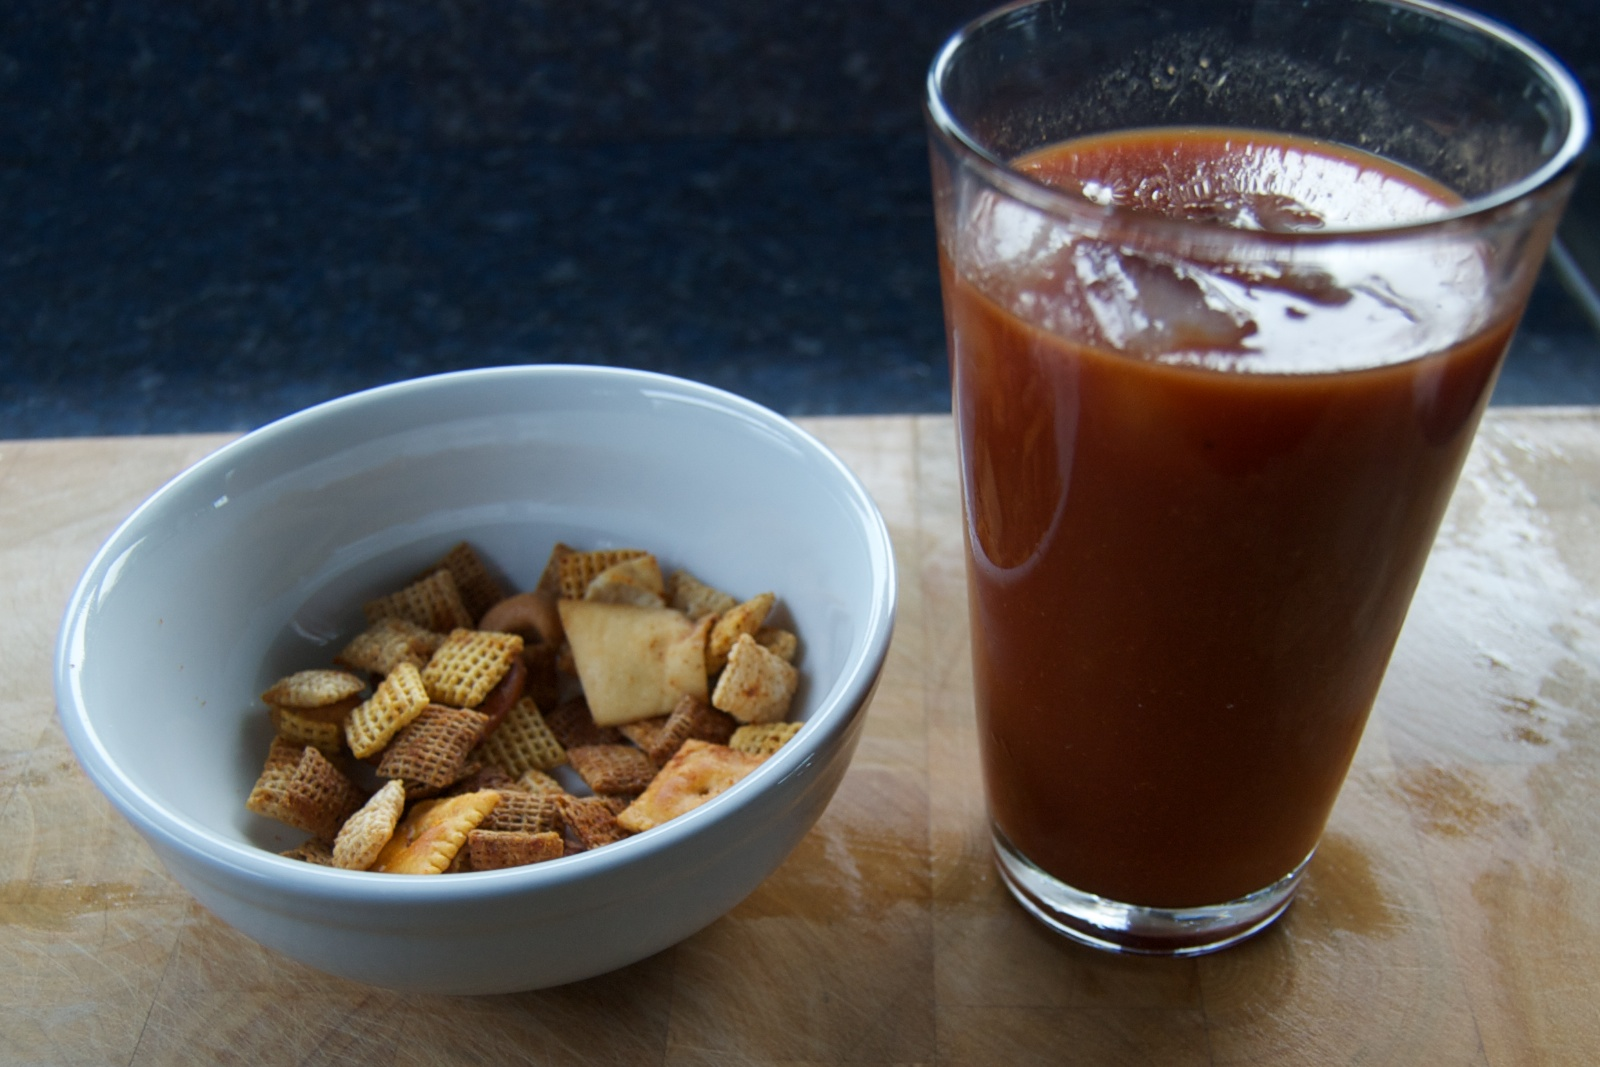 http://blog.rickk.com/food/2013/09/15/ate.2013.09.15.b.jpg